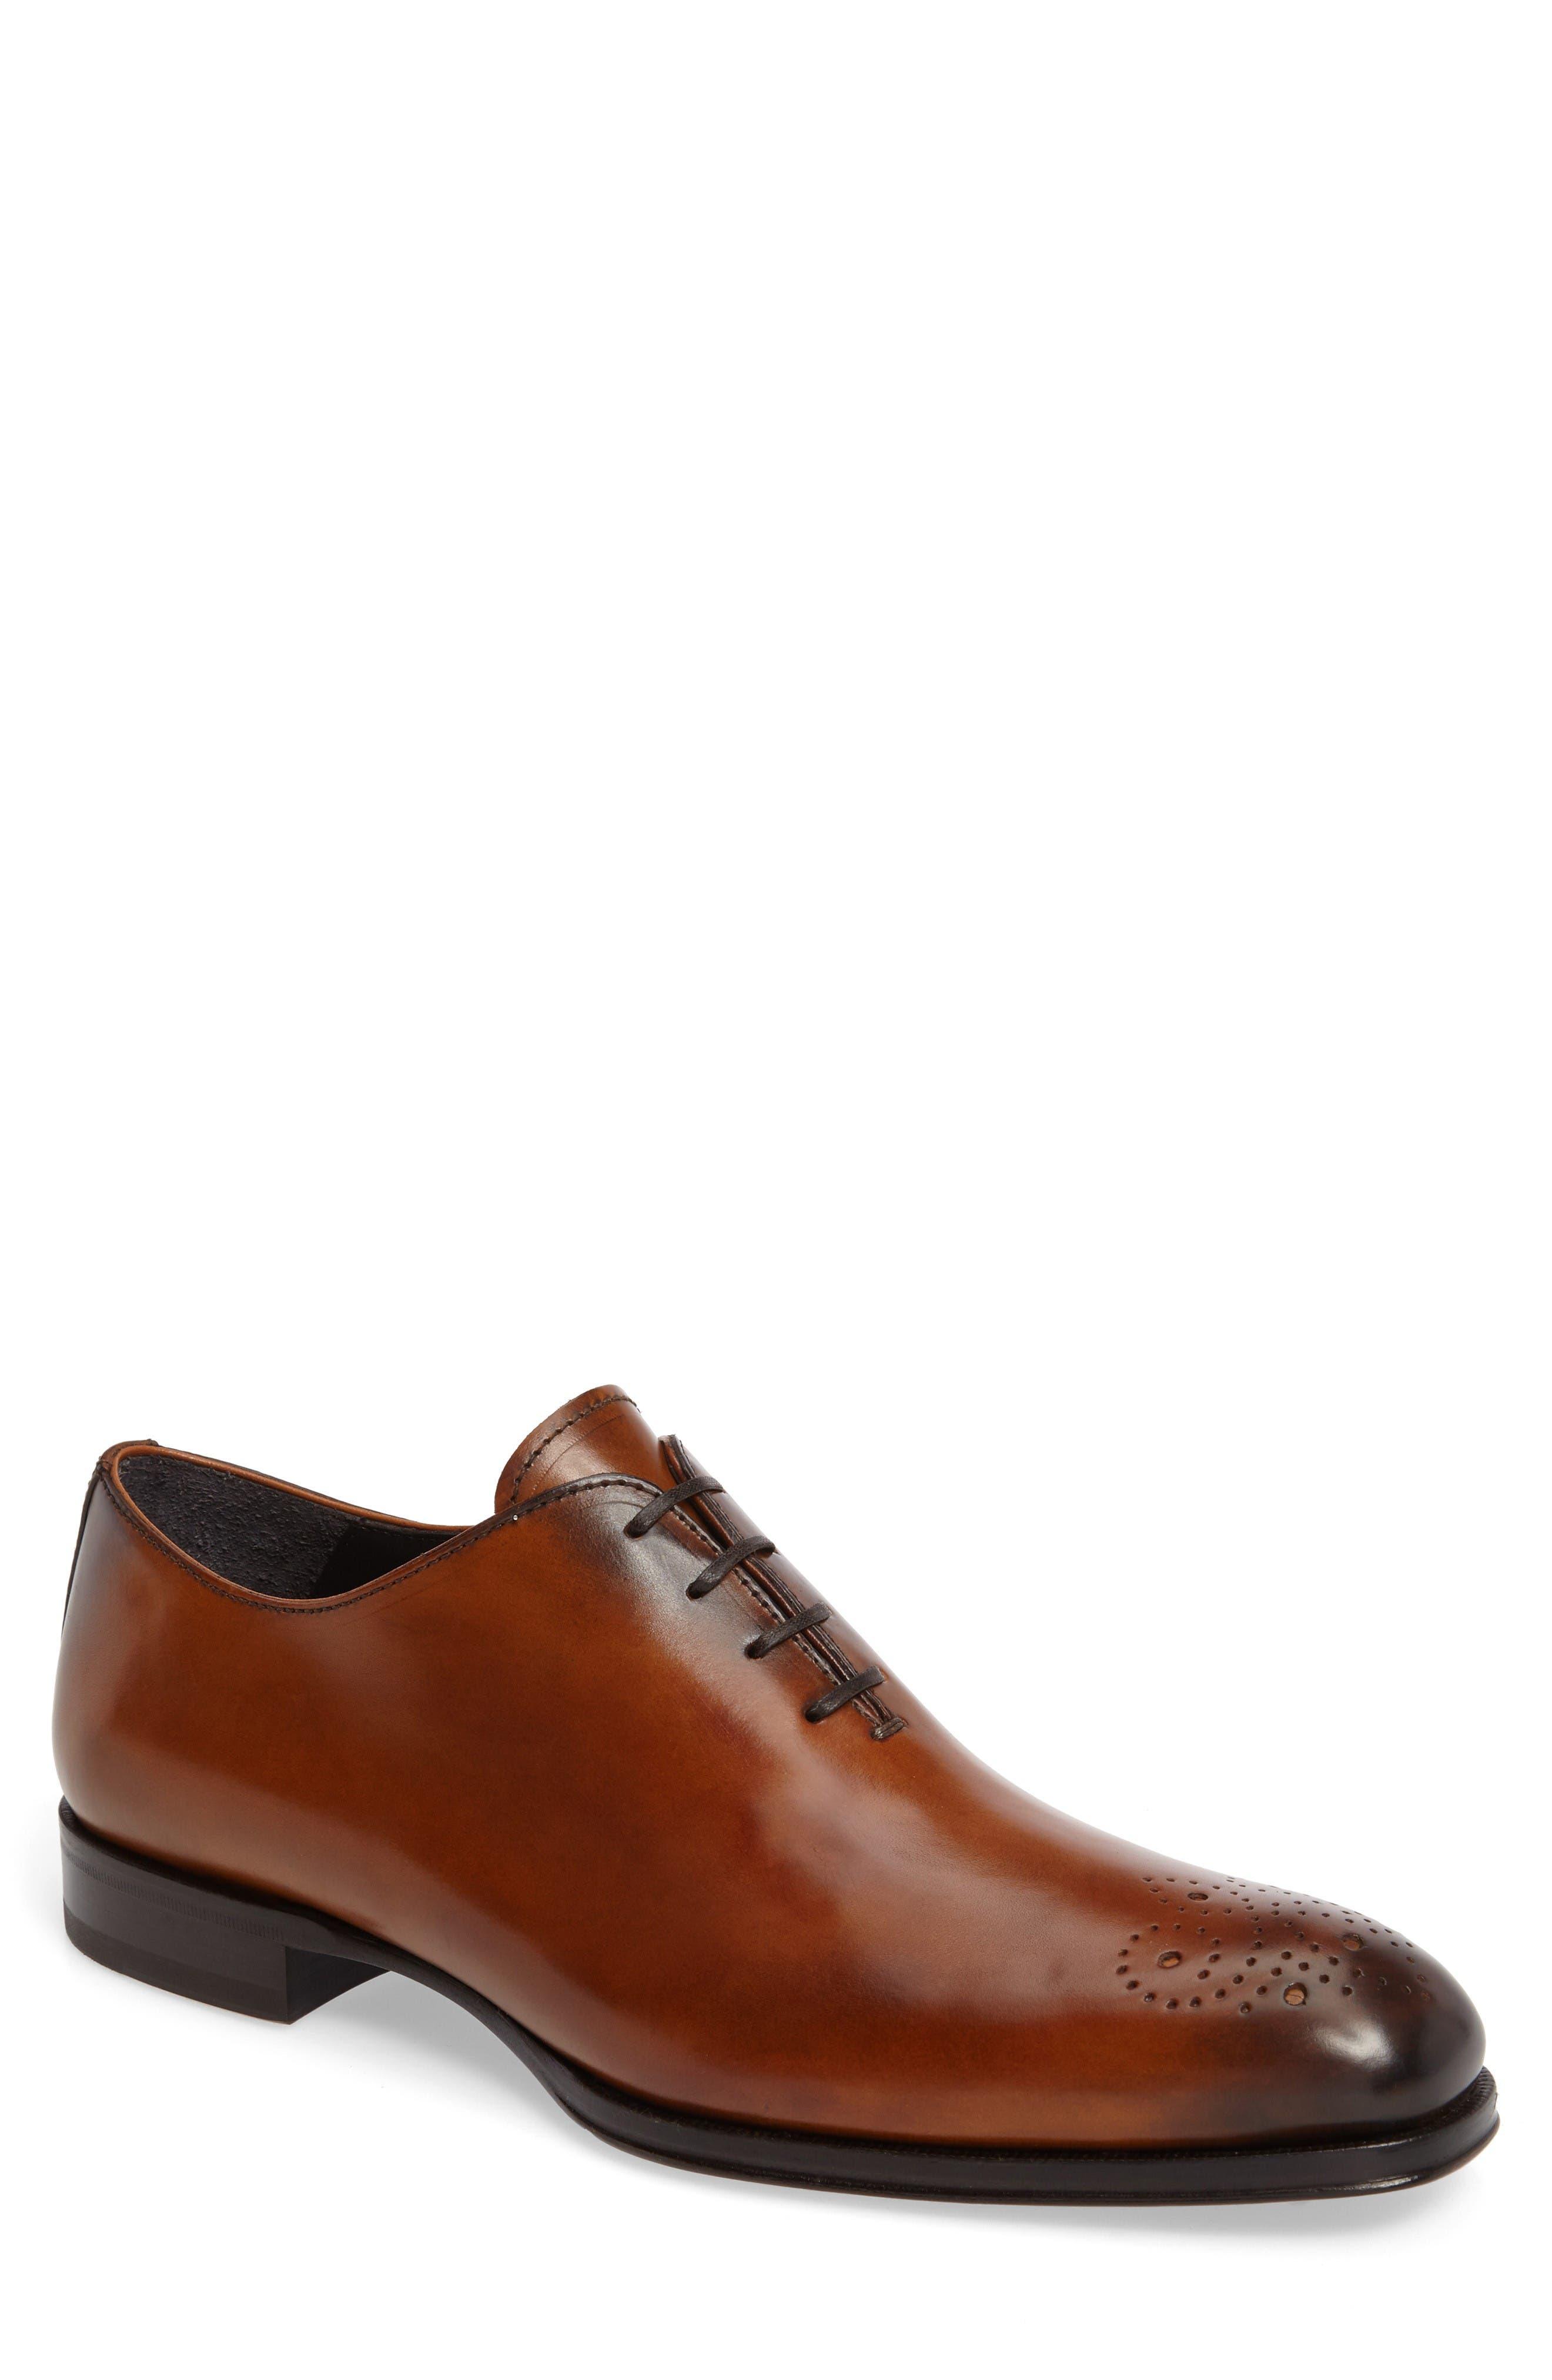 Main Image - To Boot New York Bateman Brogue Oxford (Men)